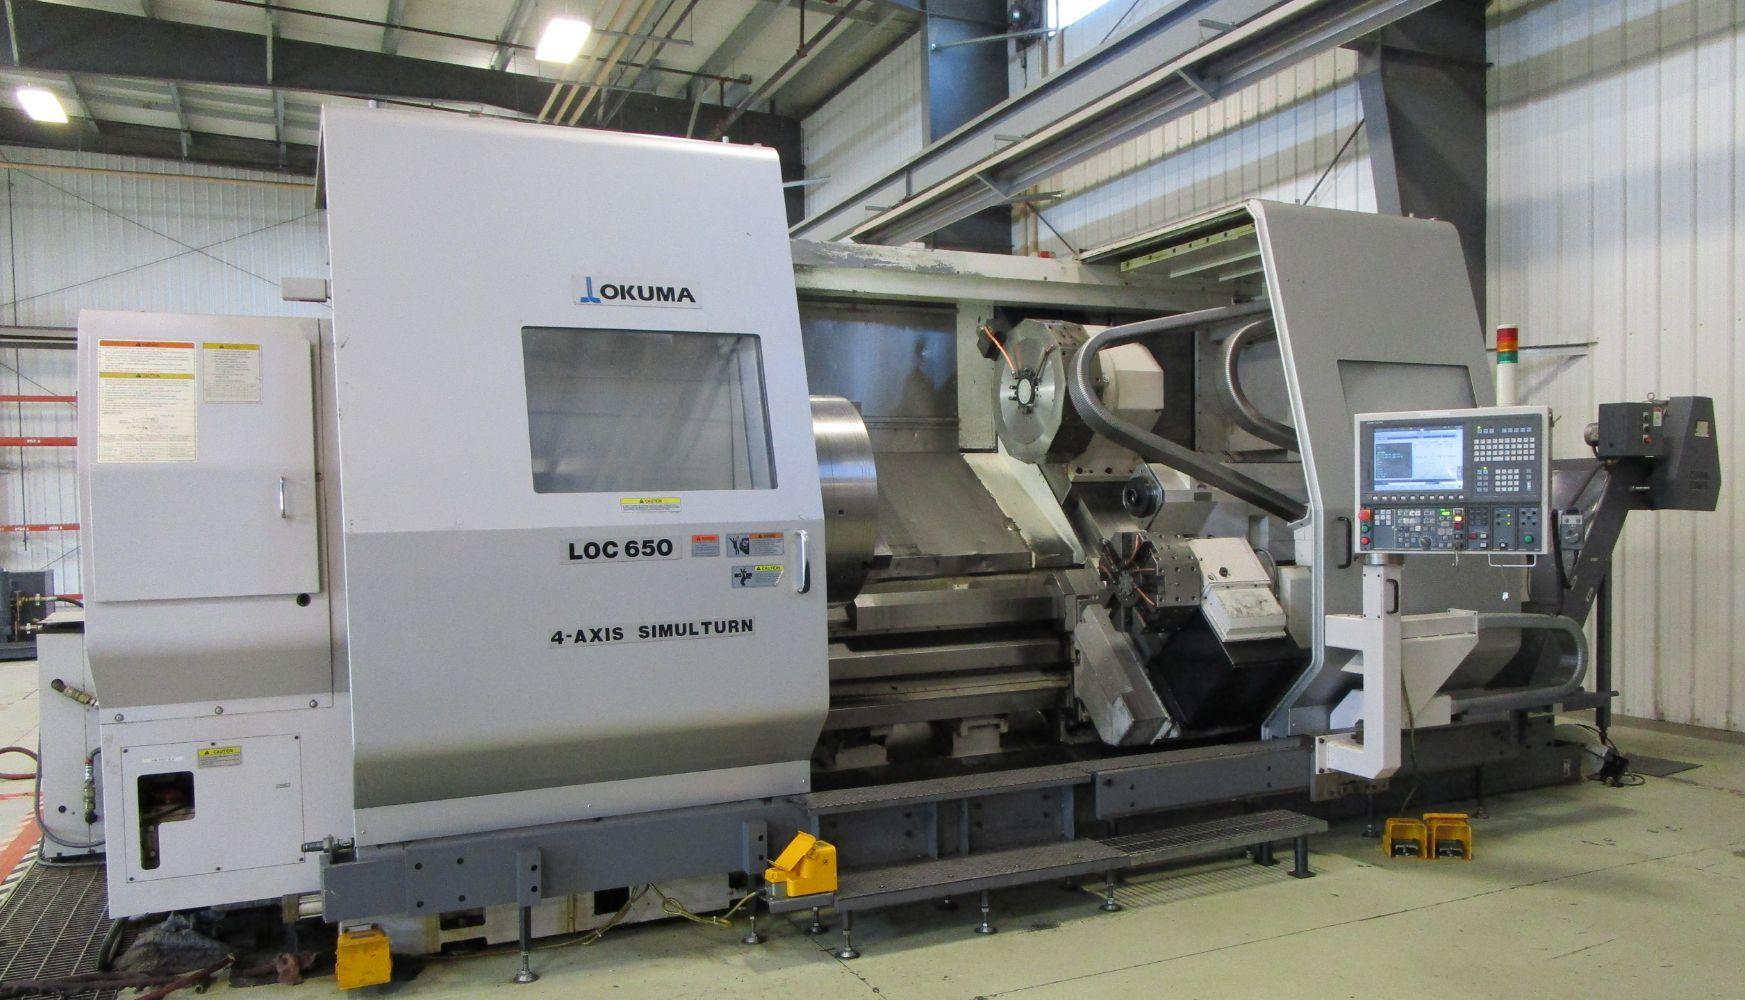 Summit Machine Ltd - Complete Offering of Show Room Condition Machine Tools & Equipment